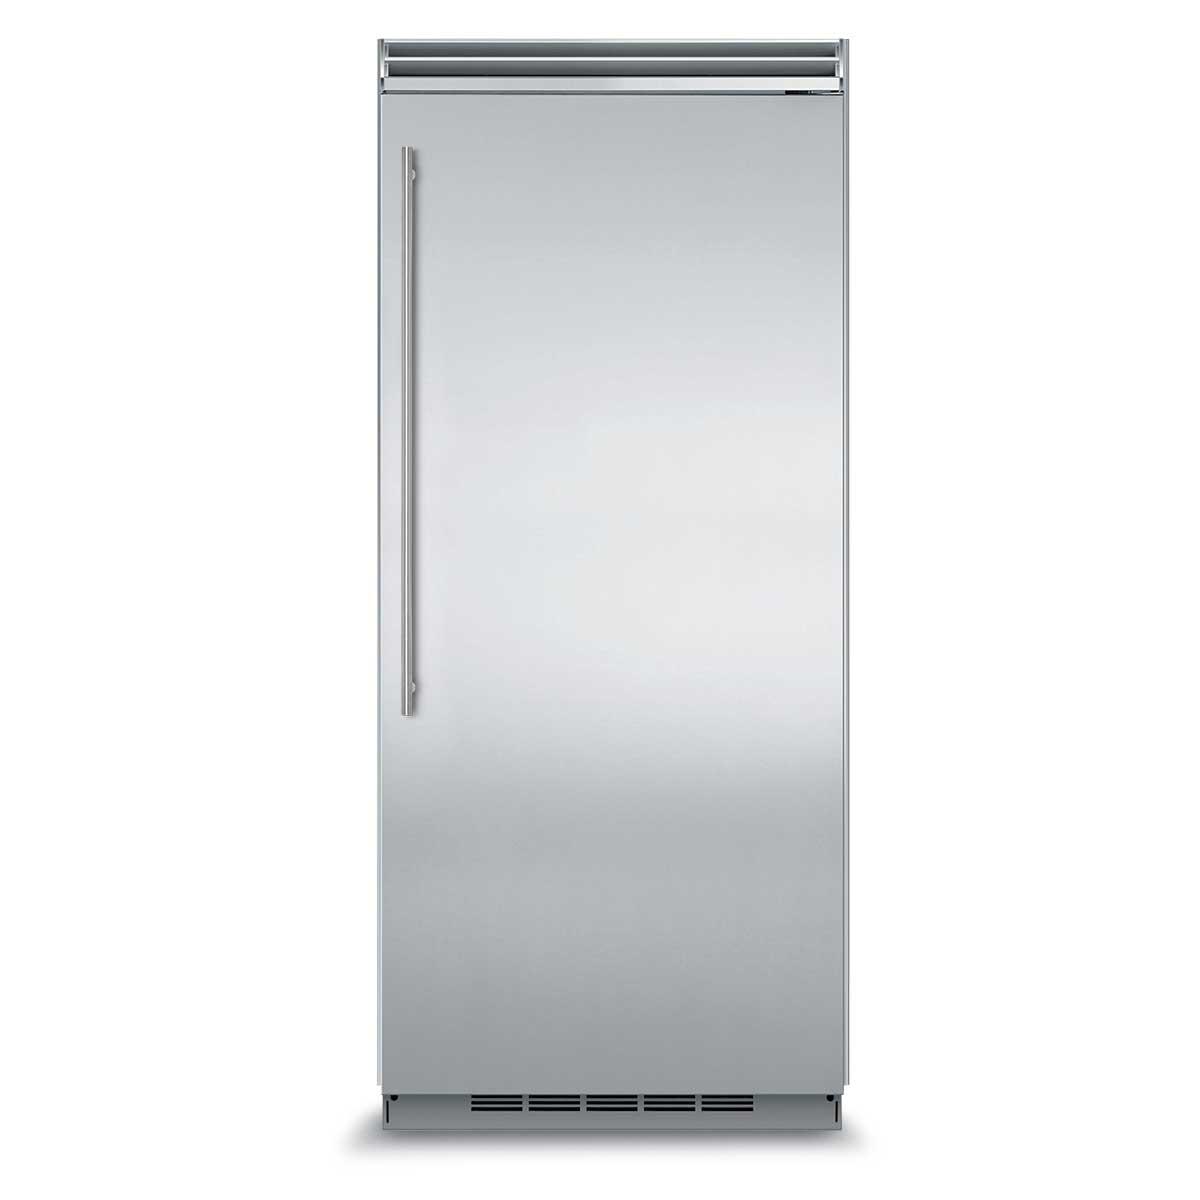 "Model: 42249470  | Marvel  Marvel Professional Built-In 36"" All Freezer-Optional Accessories Professional Handle ? Vertical Door Installation (qty 1)"